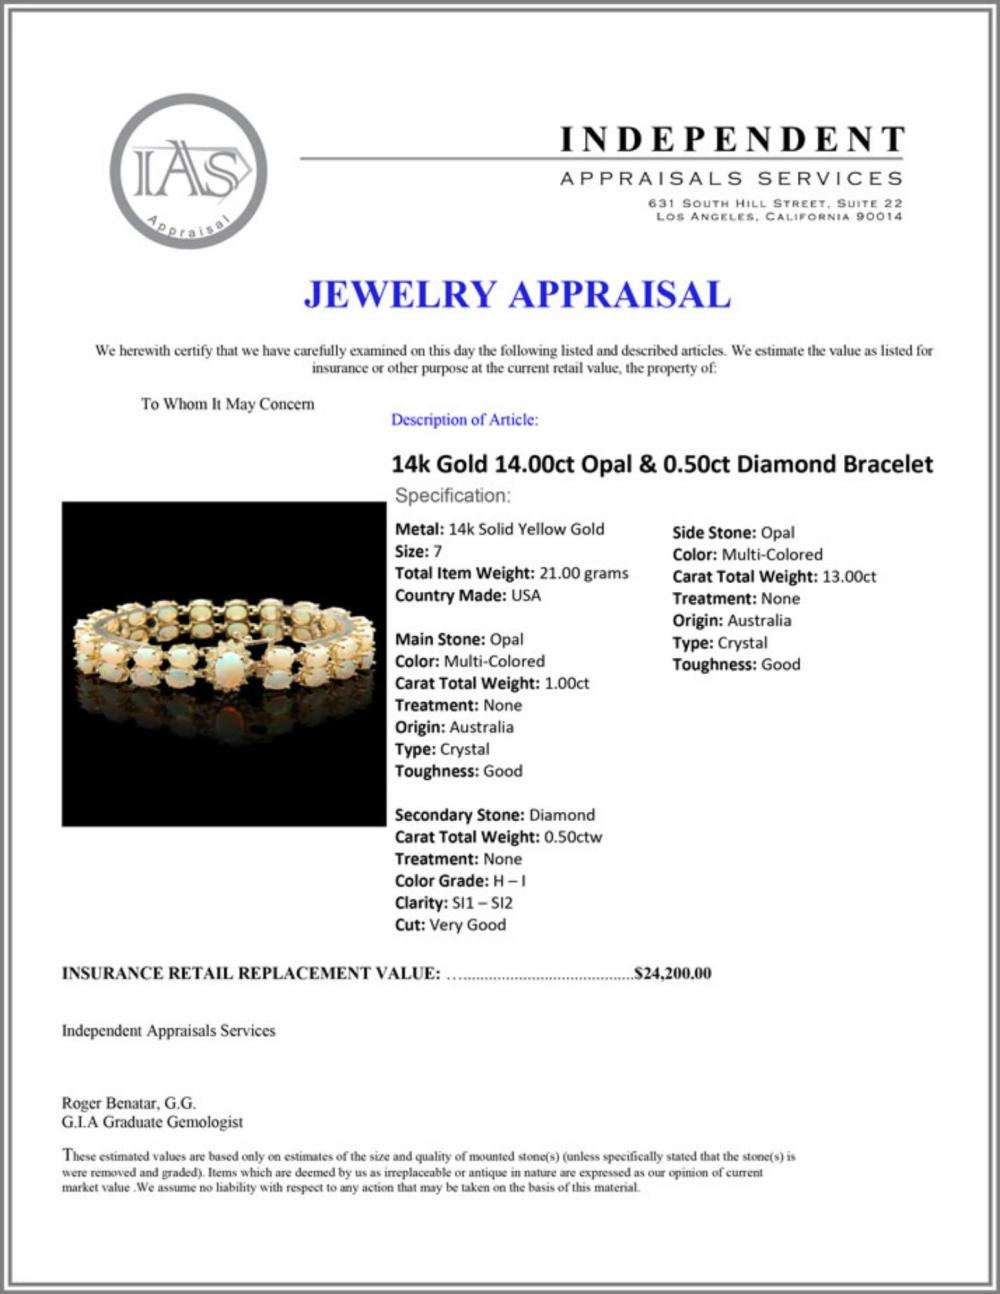 Lot 18: `14k Gold 14.00ct Opal & 0.50ct Diamond Bracelet